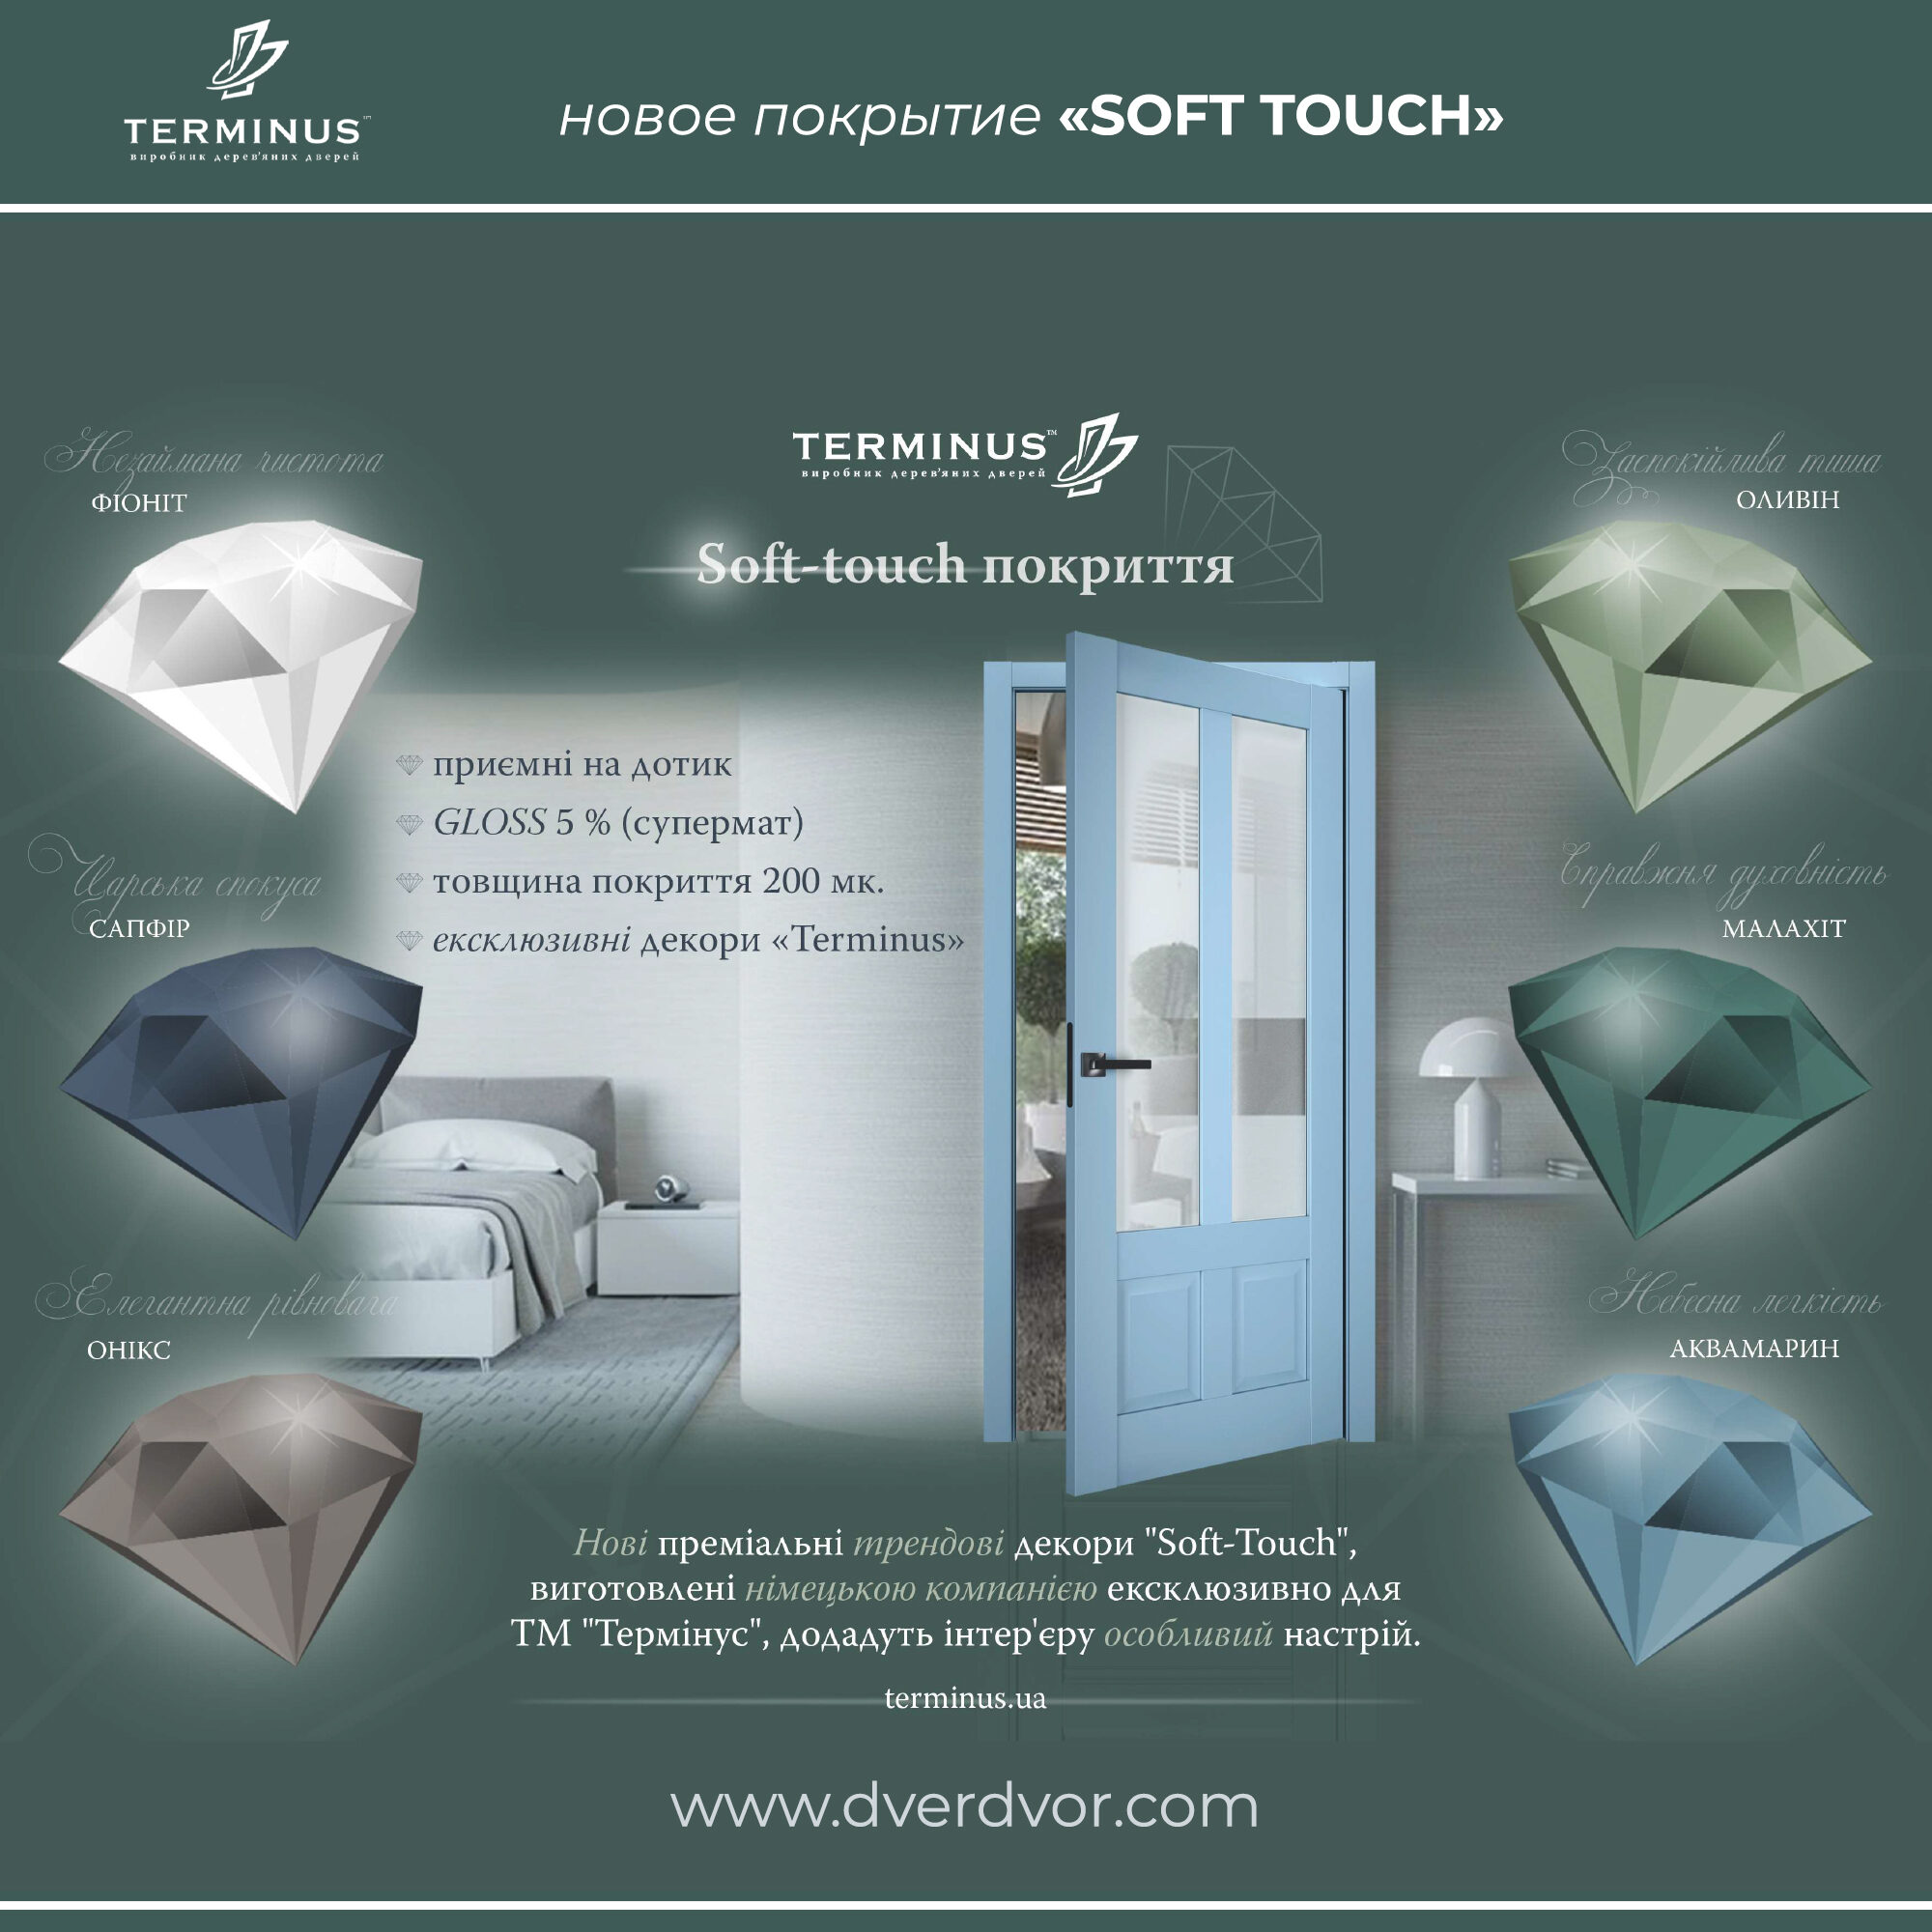 Новое покрытие Soft-Touch